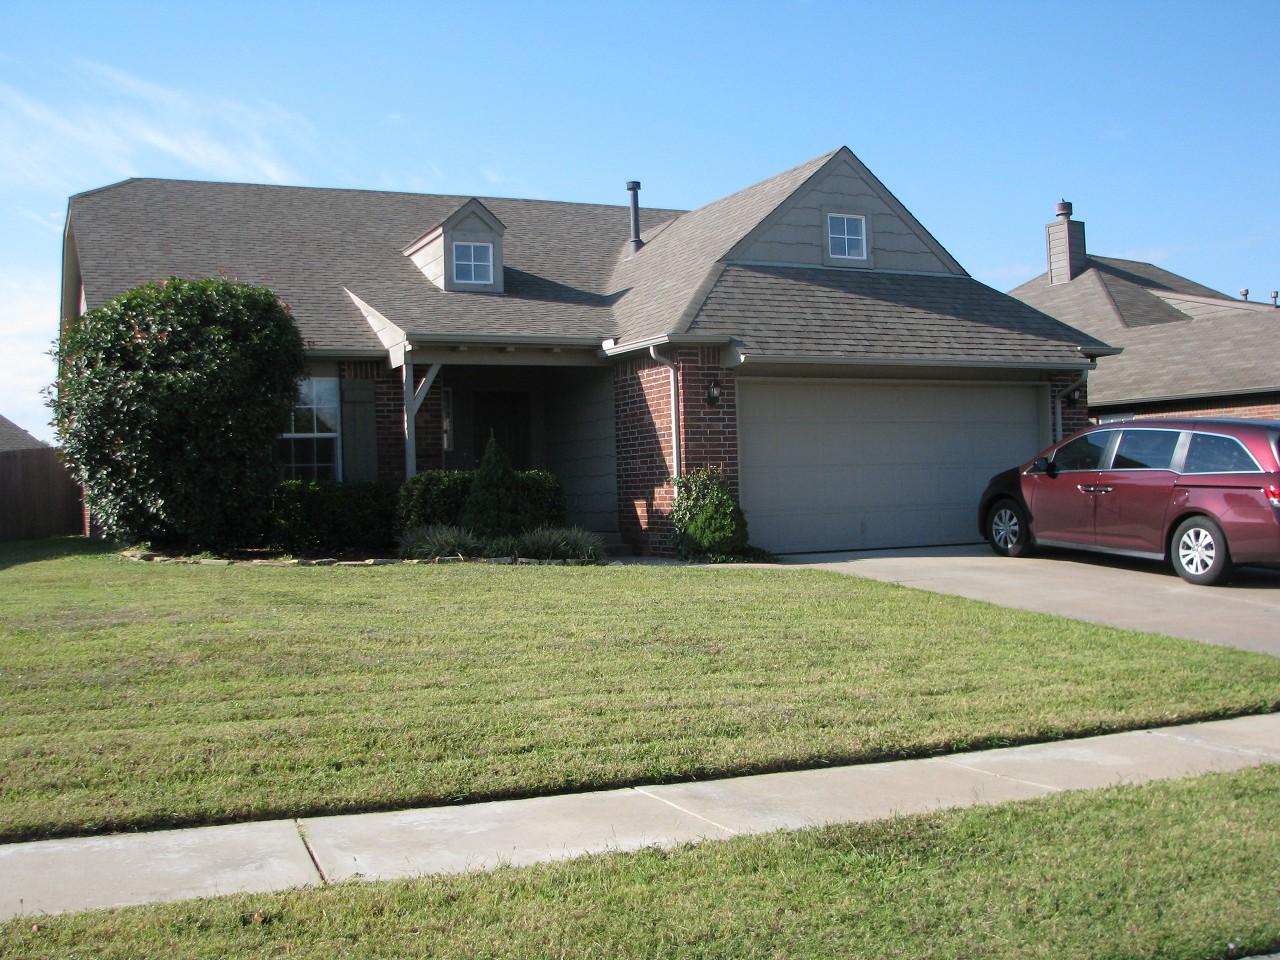 Single Family Home for Sale, ListingId:30128688, location: 20392 E 32nd Street Broken Arrow 74014